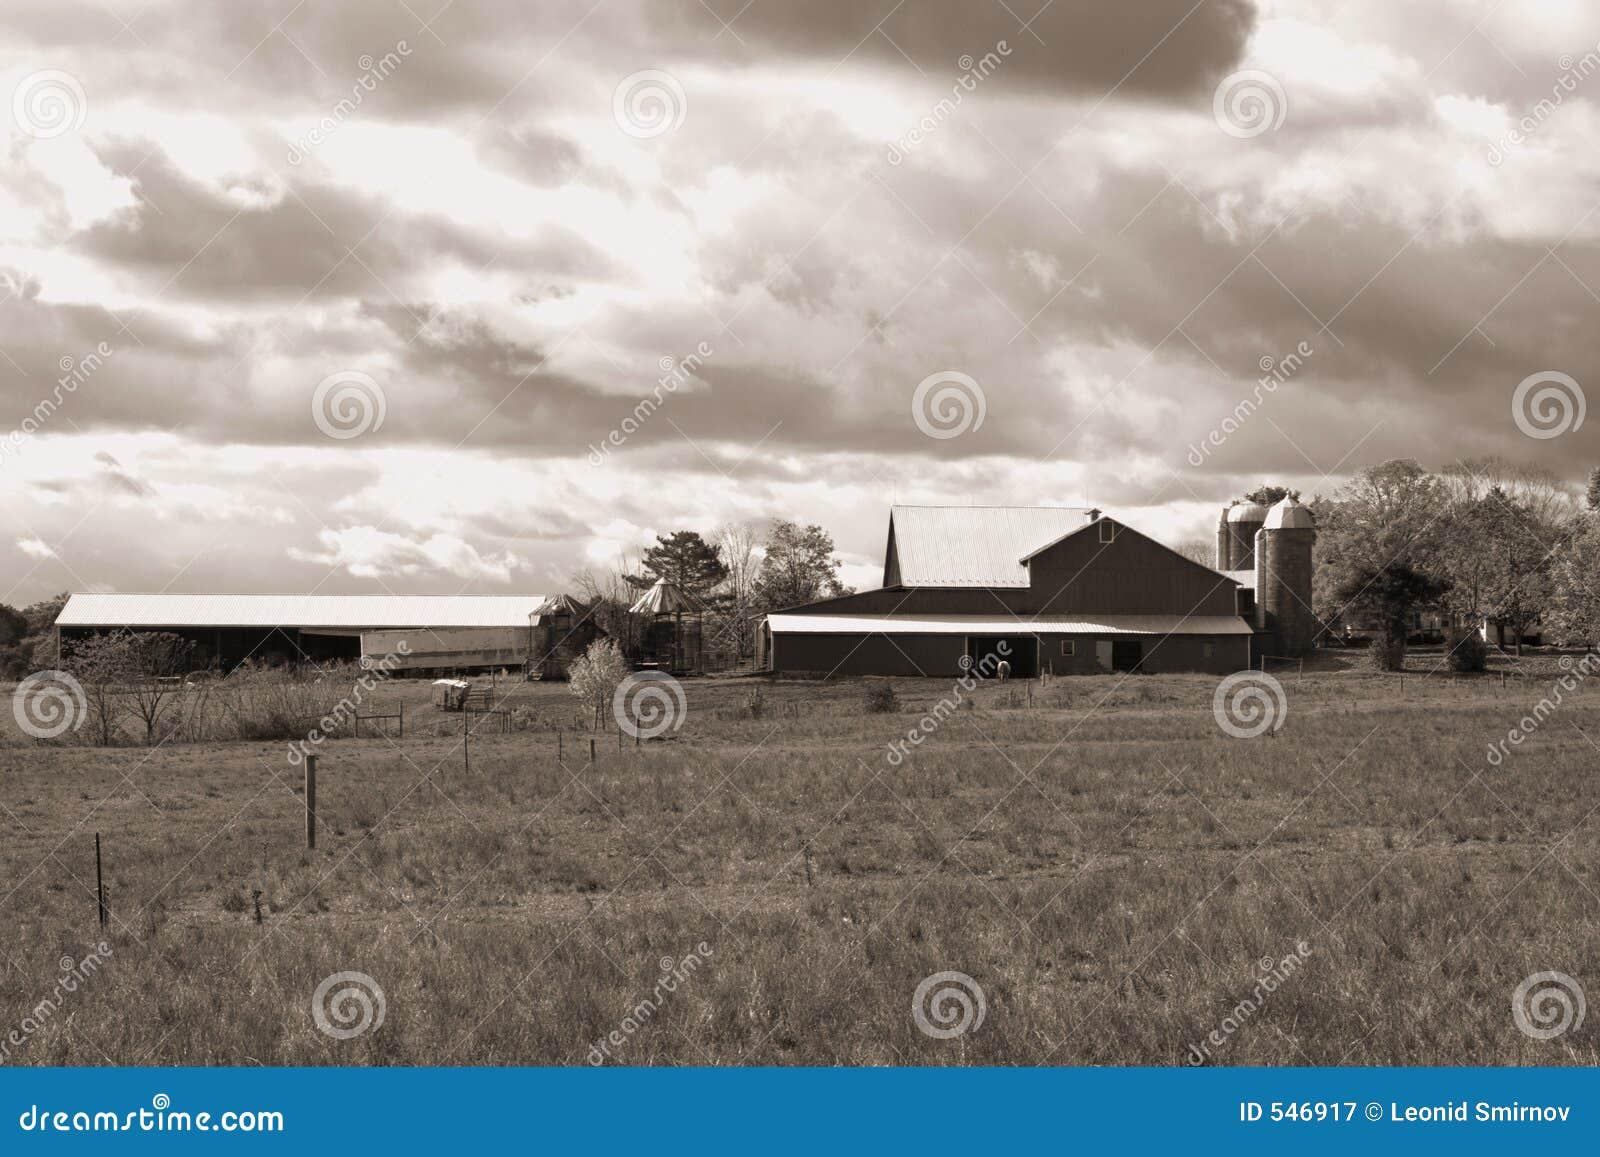 Download 在宾夕法尼亚天空w的b农场 库存图片. 图片 包括有 乡下, 布琼布拉, 布哈拉, 藏品, 陆运, 云彩, 投反对票 - 546917